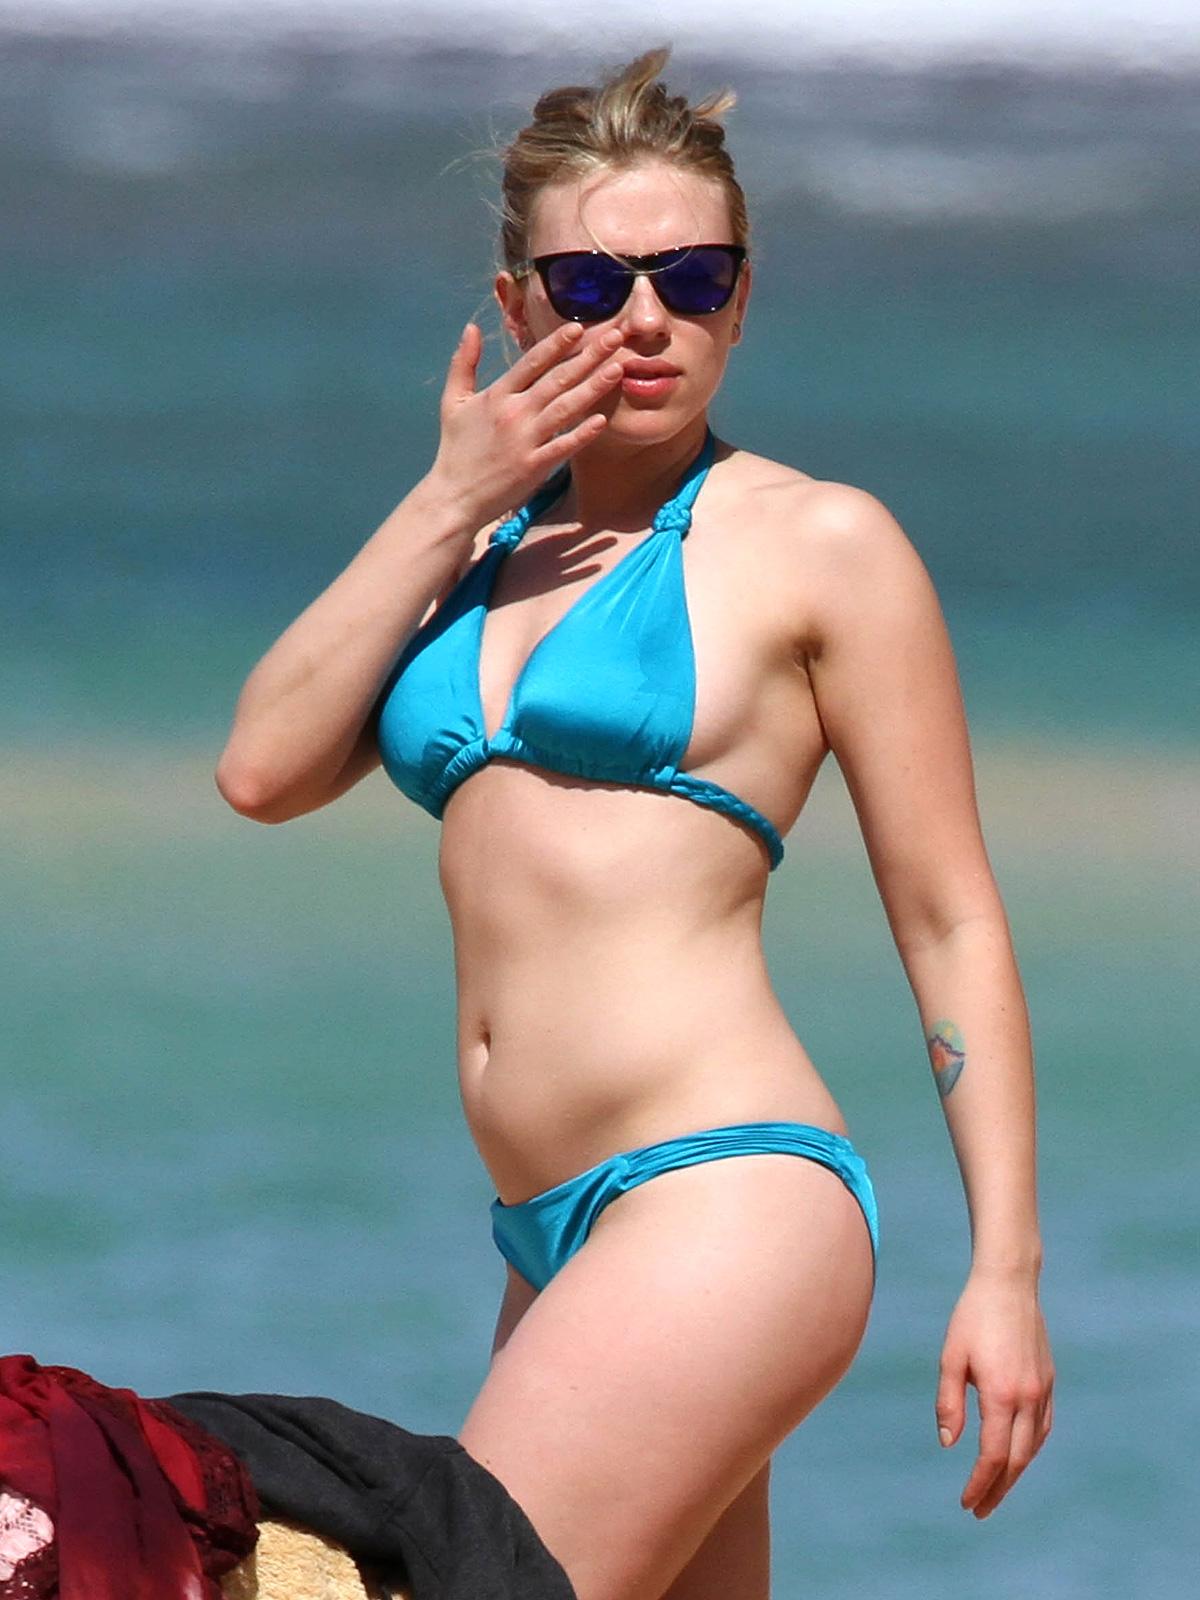 Scarlett johansson bikini photo